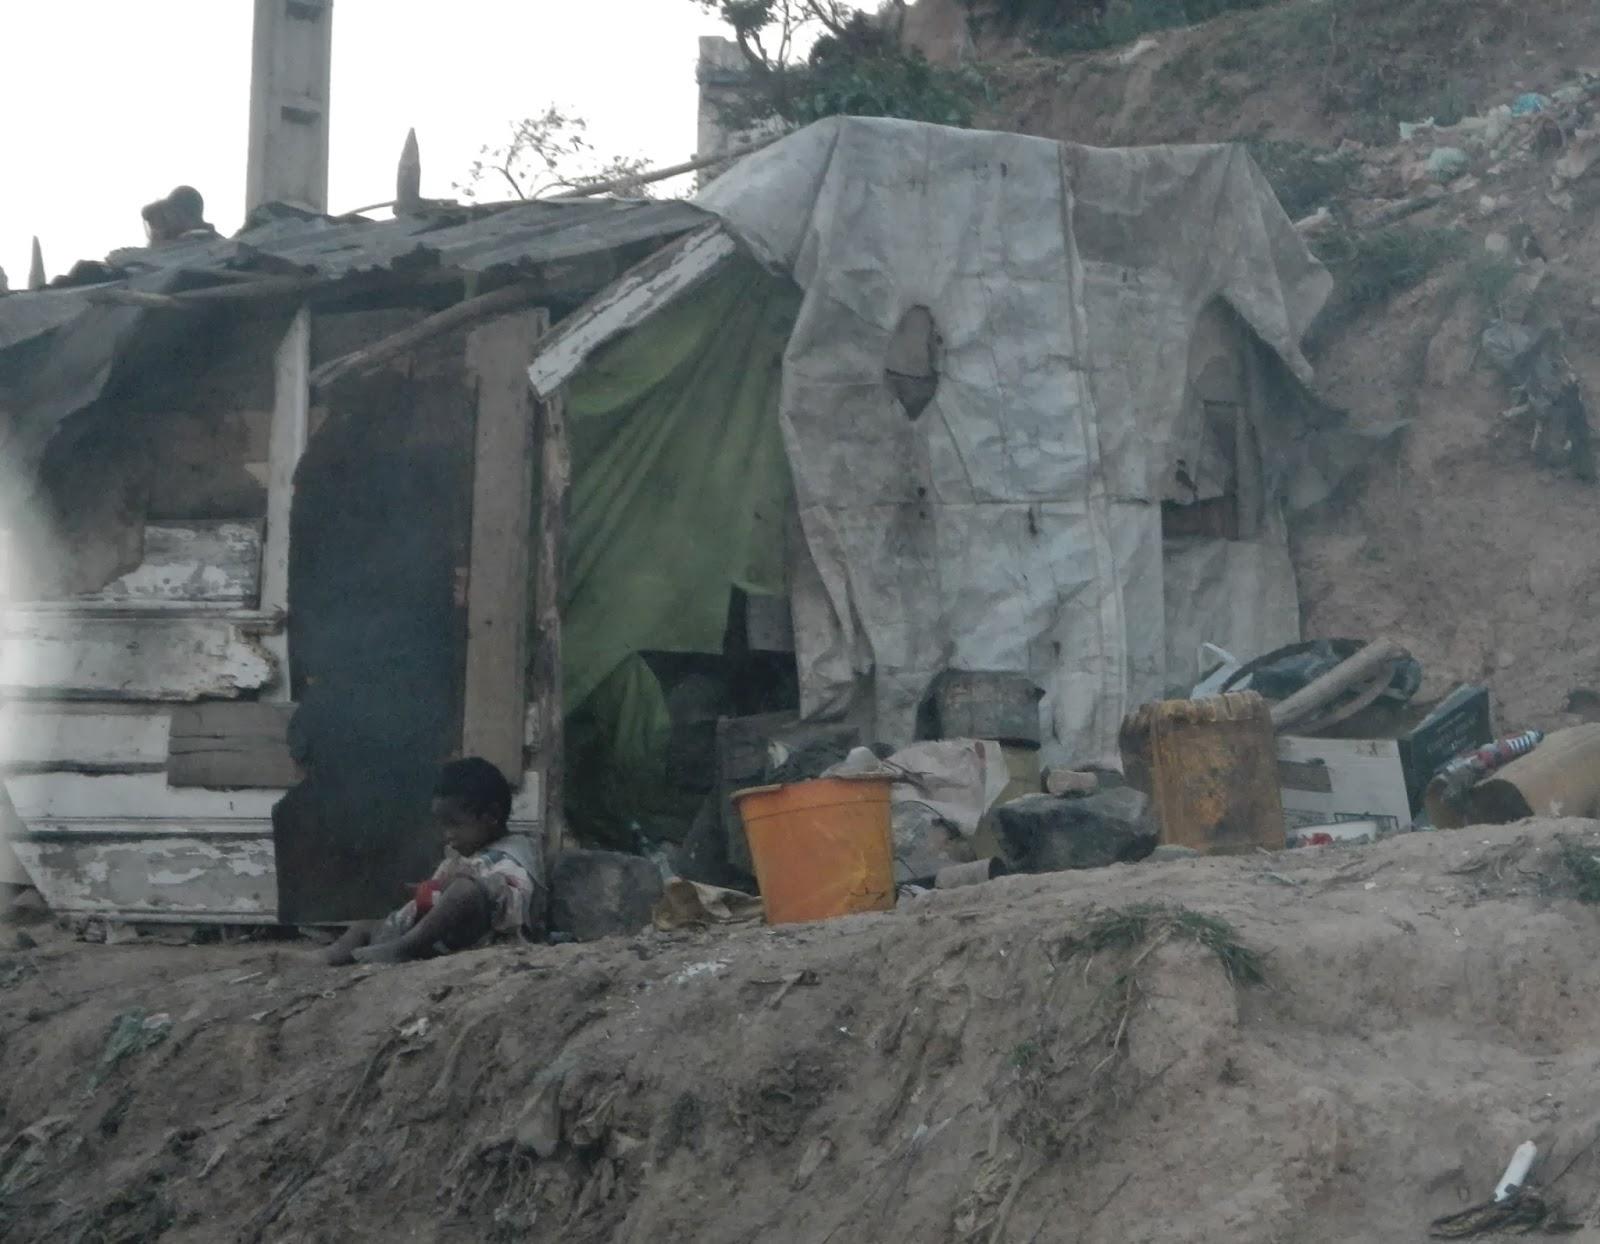 homeless people in america essay